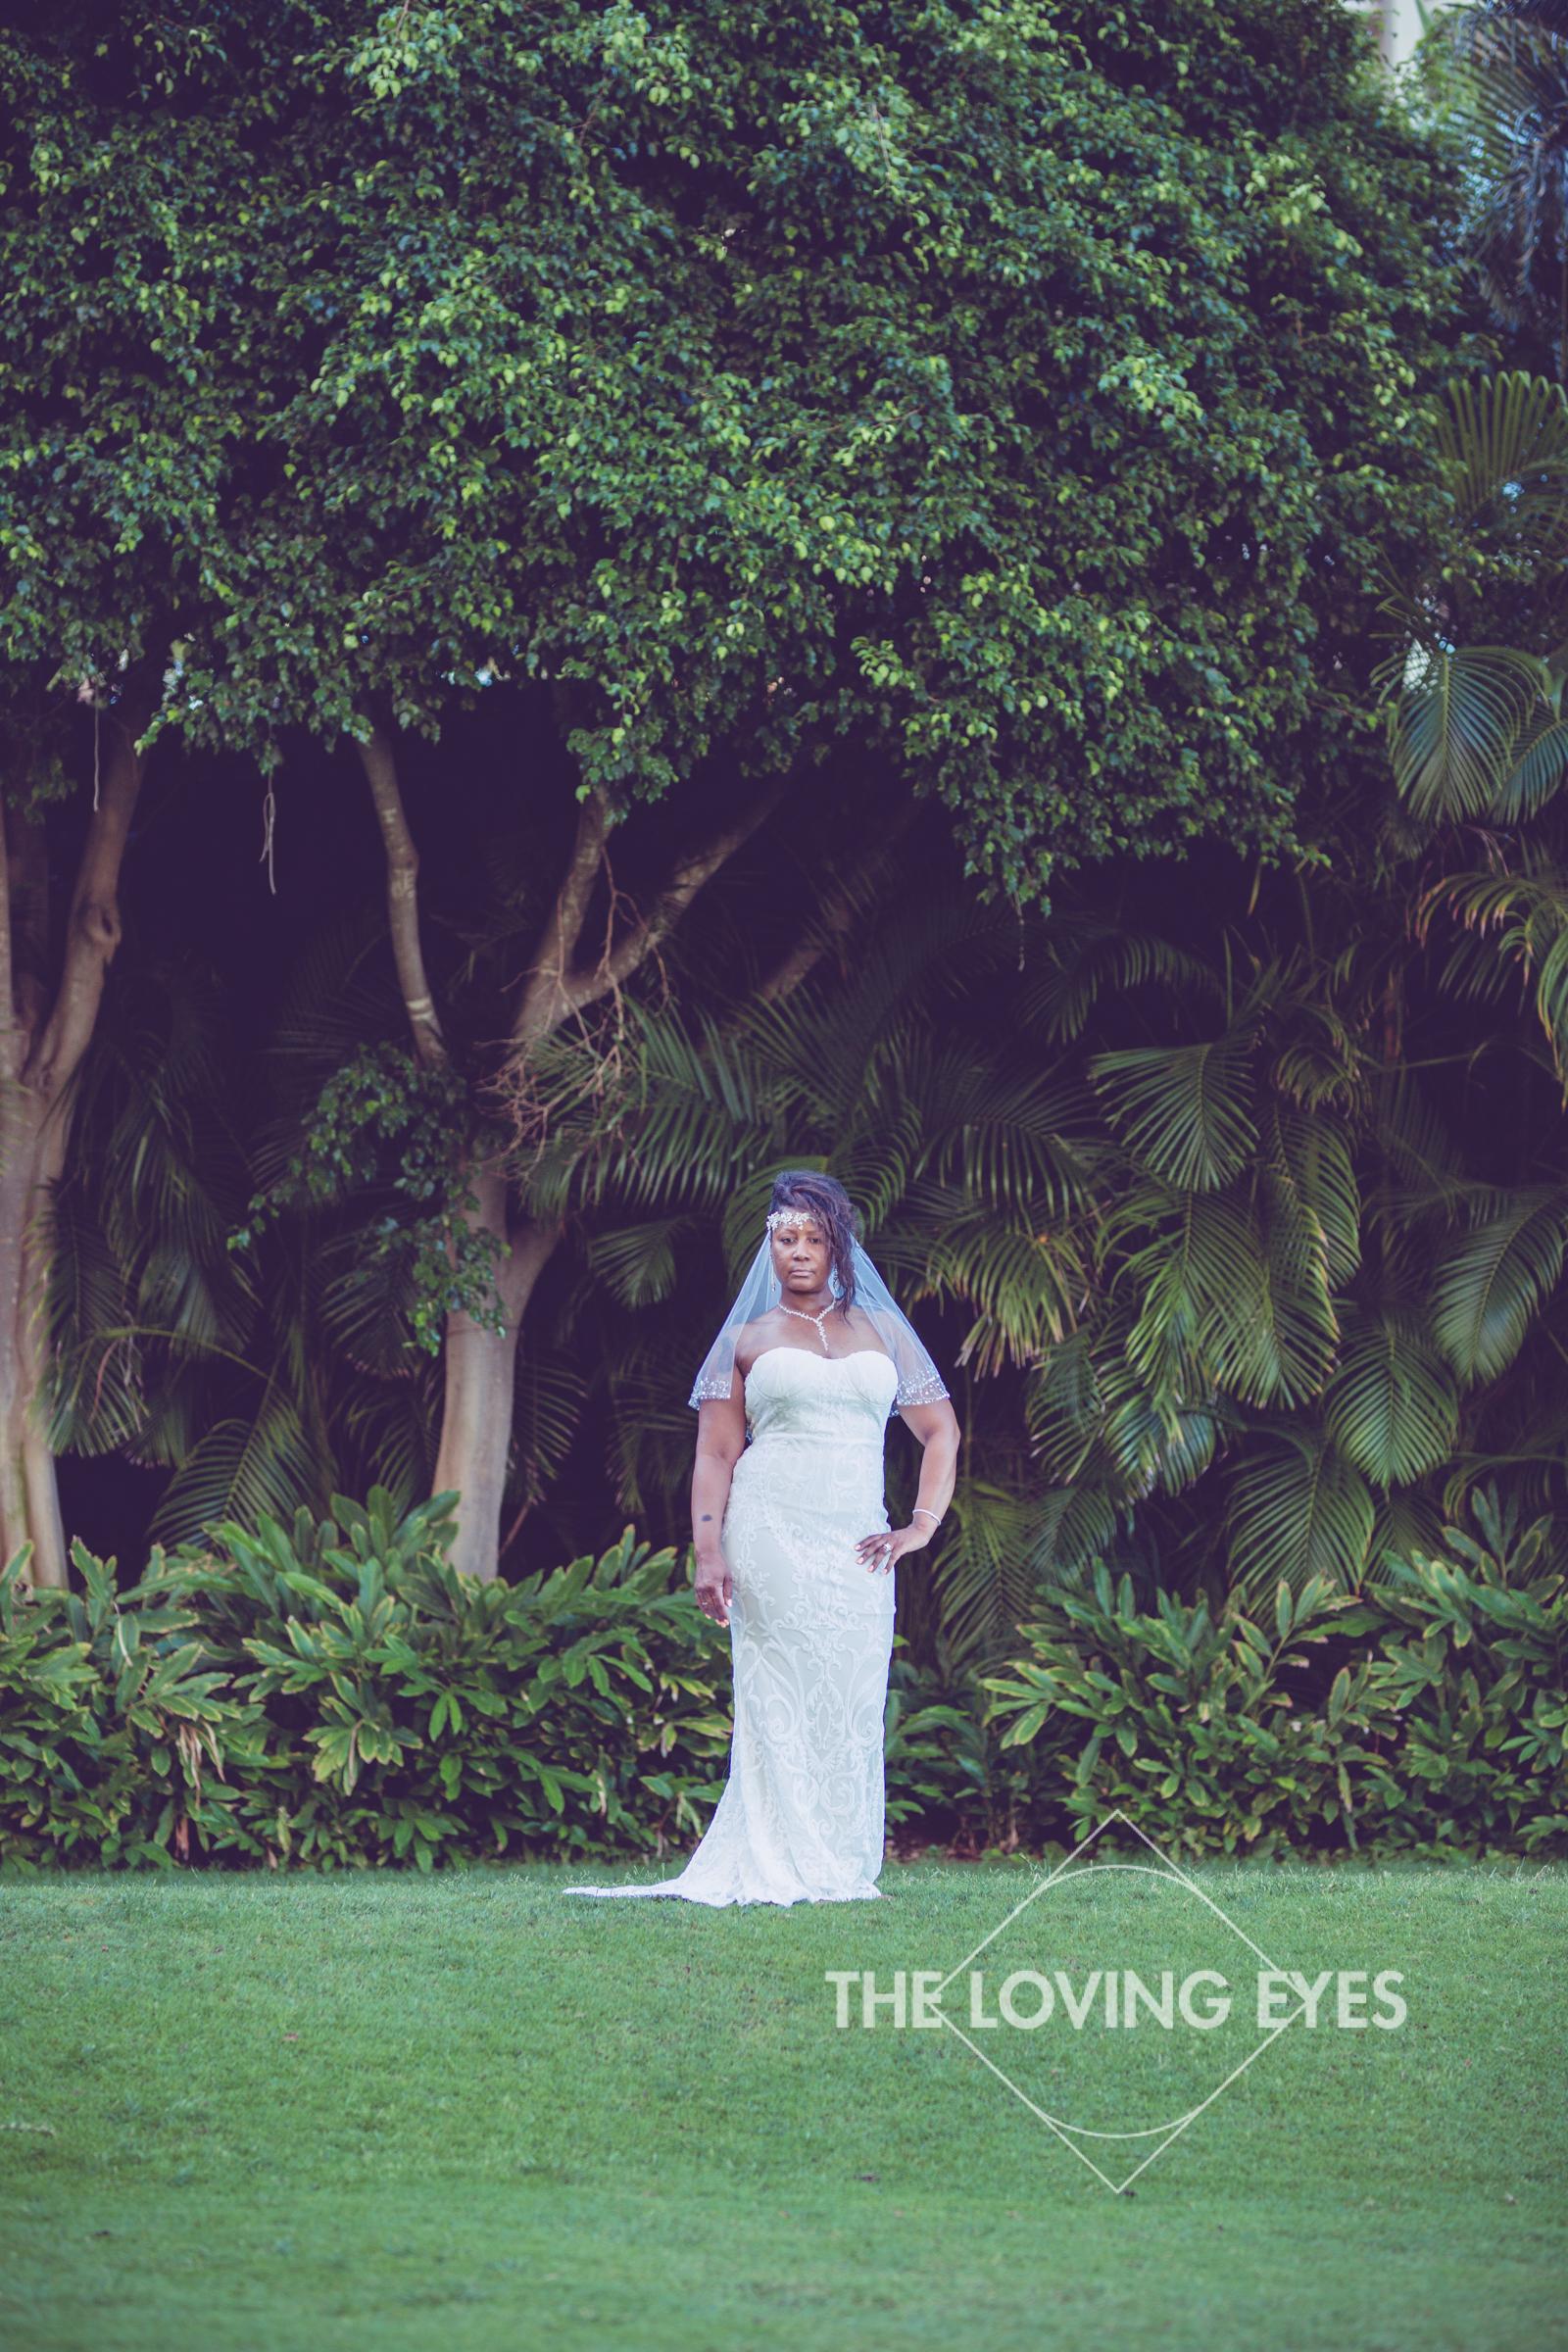 Honeymoon-Photos-in-Waikiki-7.jpg